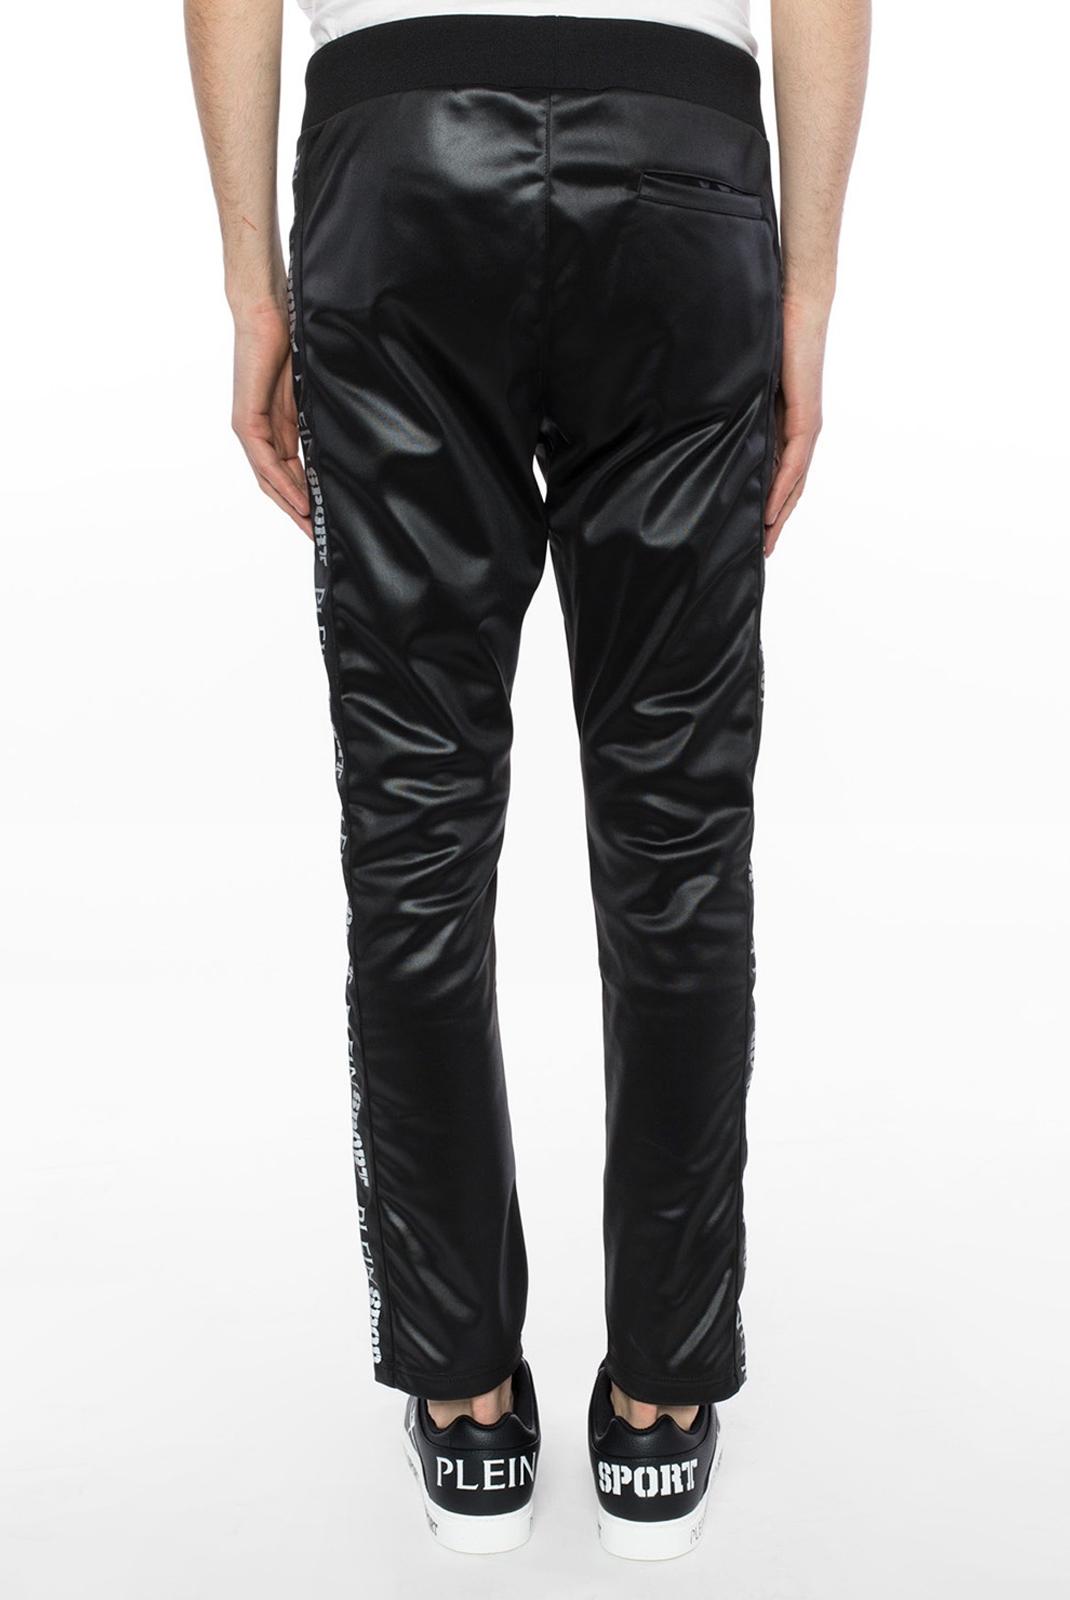 Pantalons sport/streetwear  Plein Sport MJT0451 BLACK